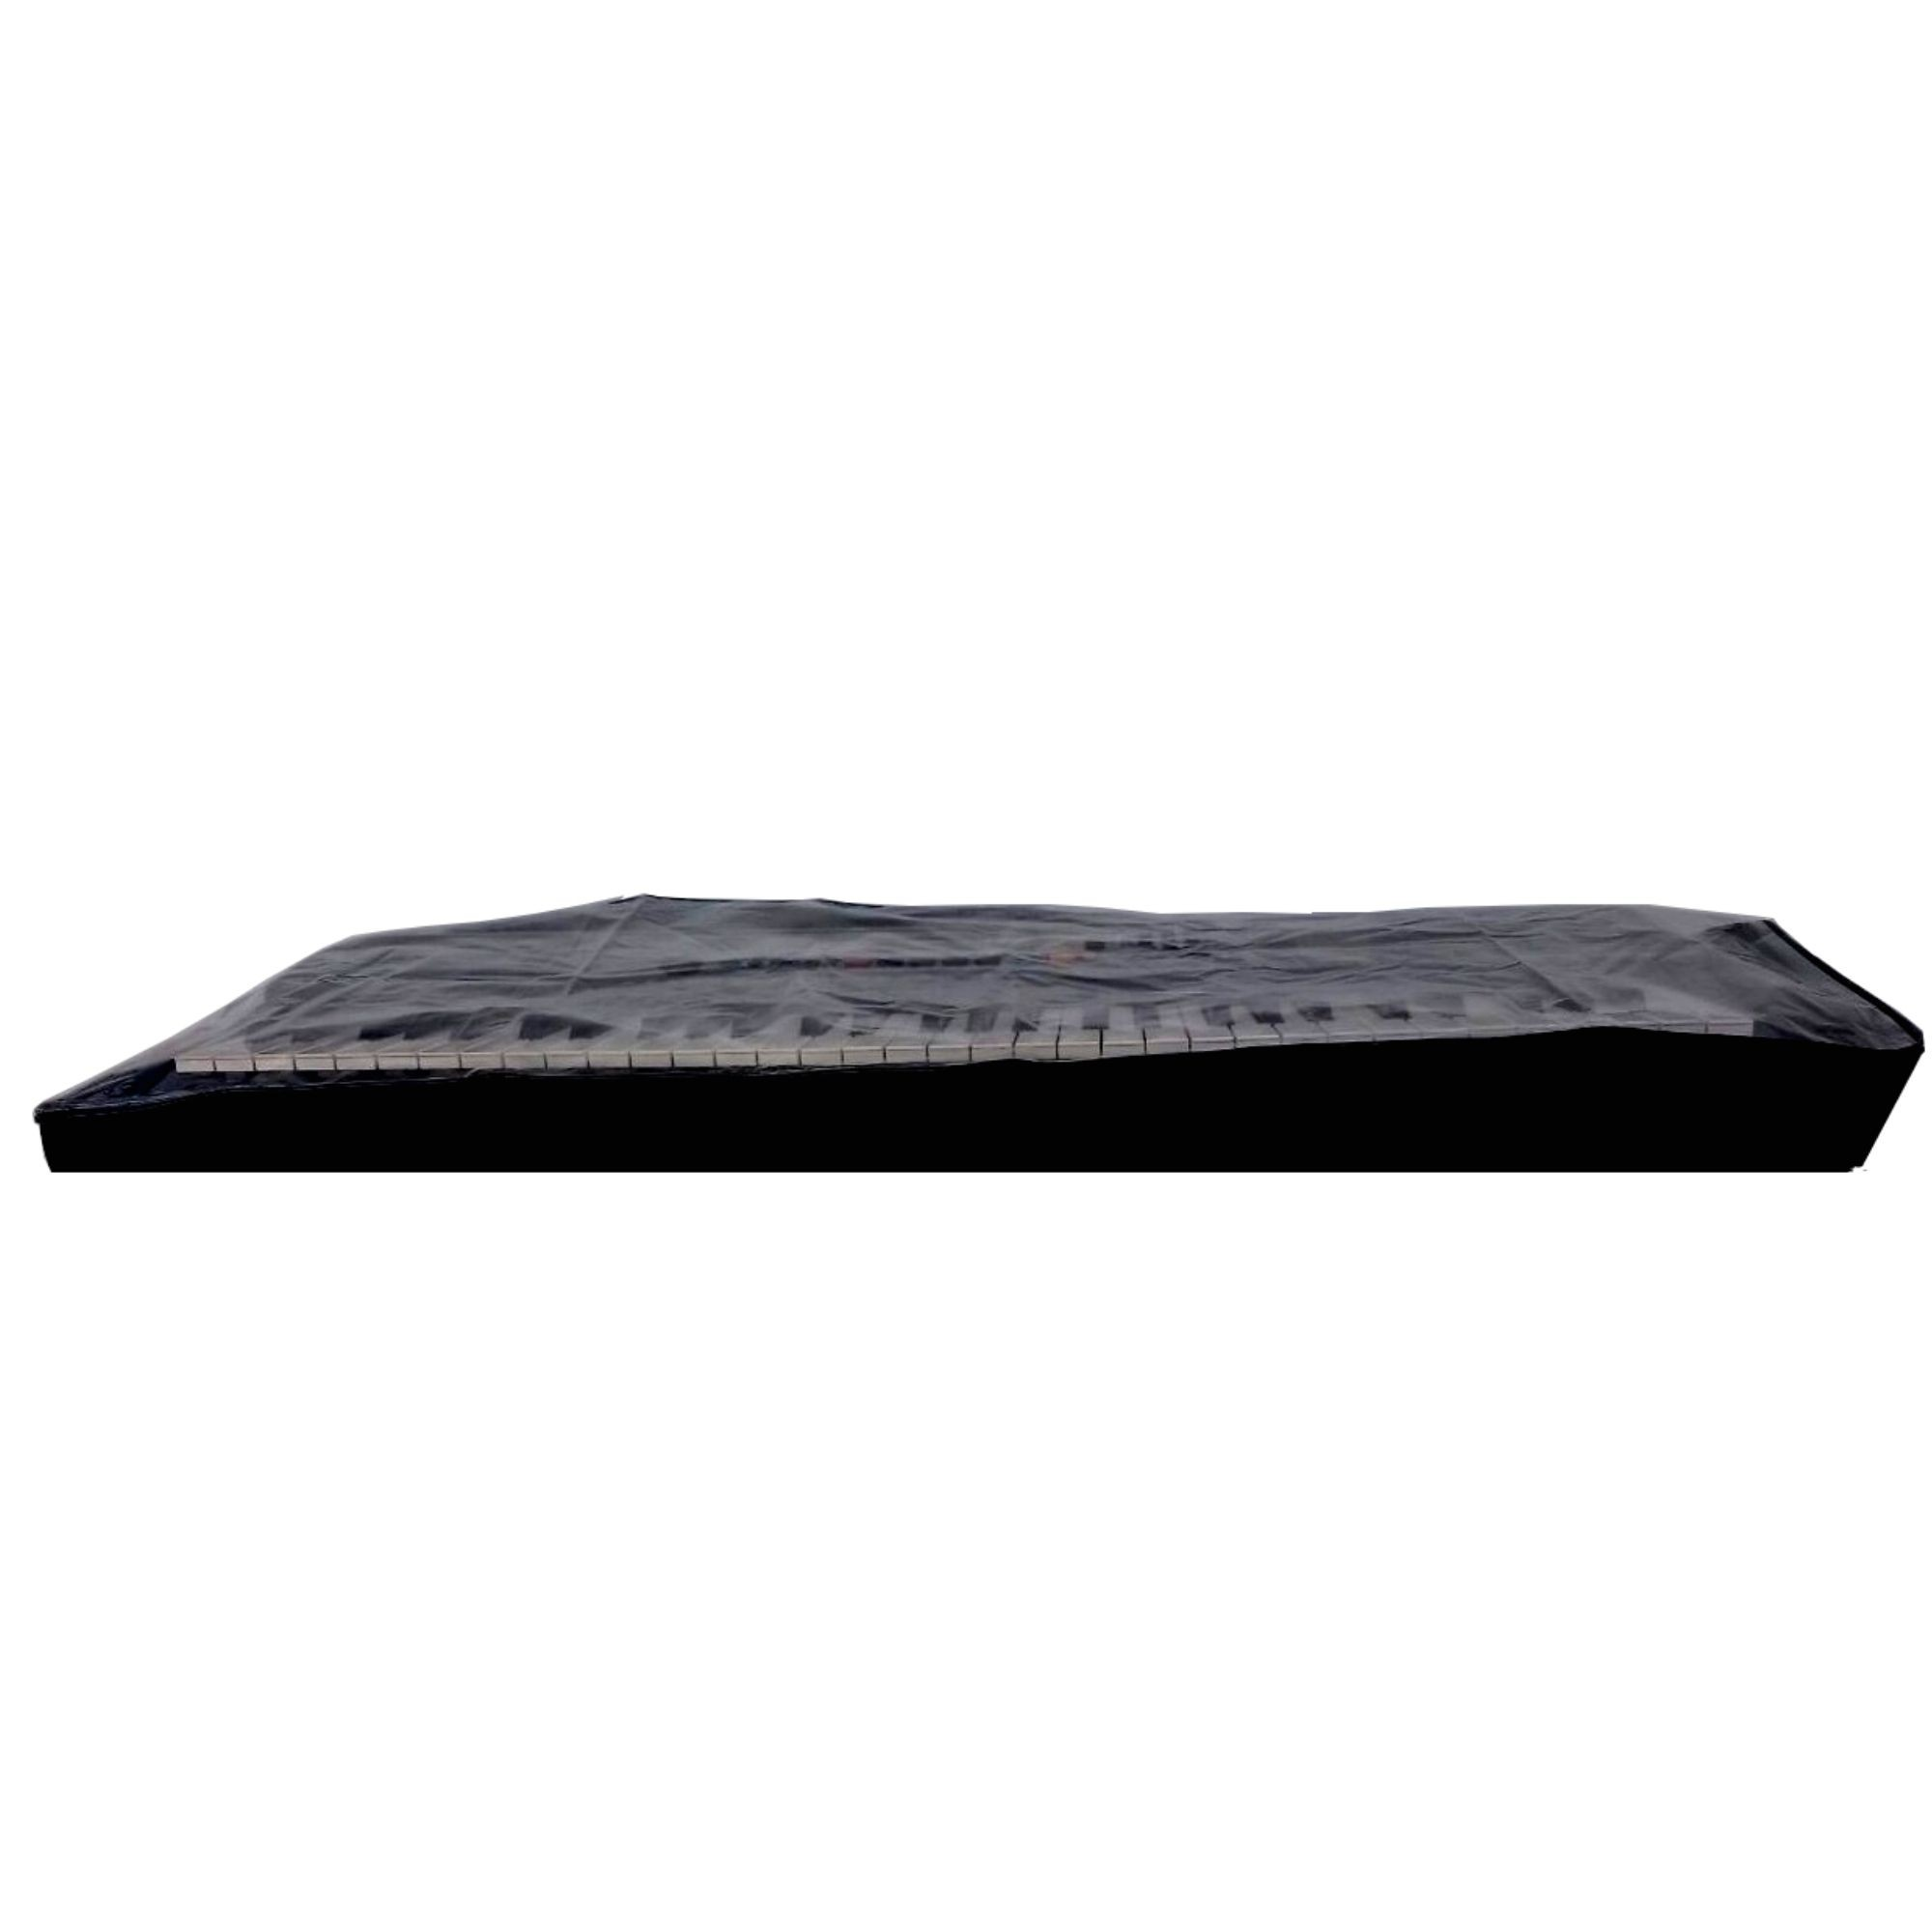 kit capa Semi-case Gold para teclado XPS 30 + capa expositora cristal XPS 30